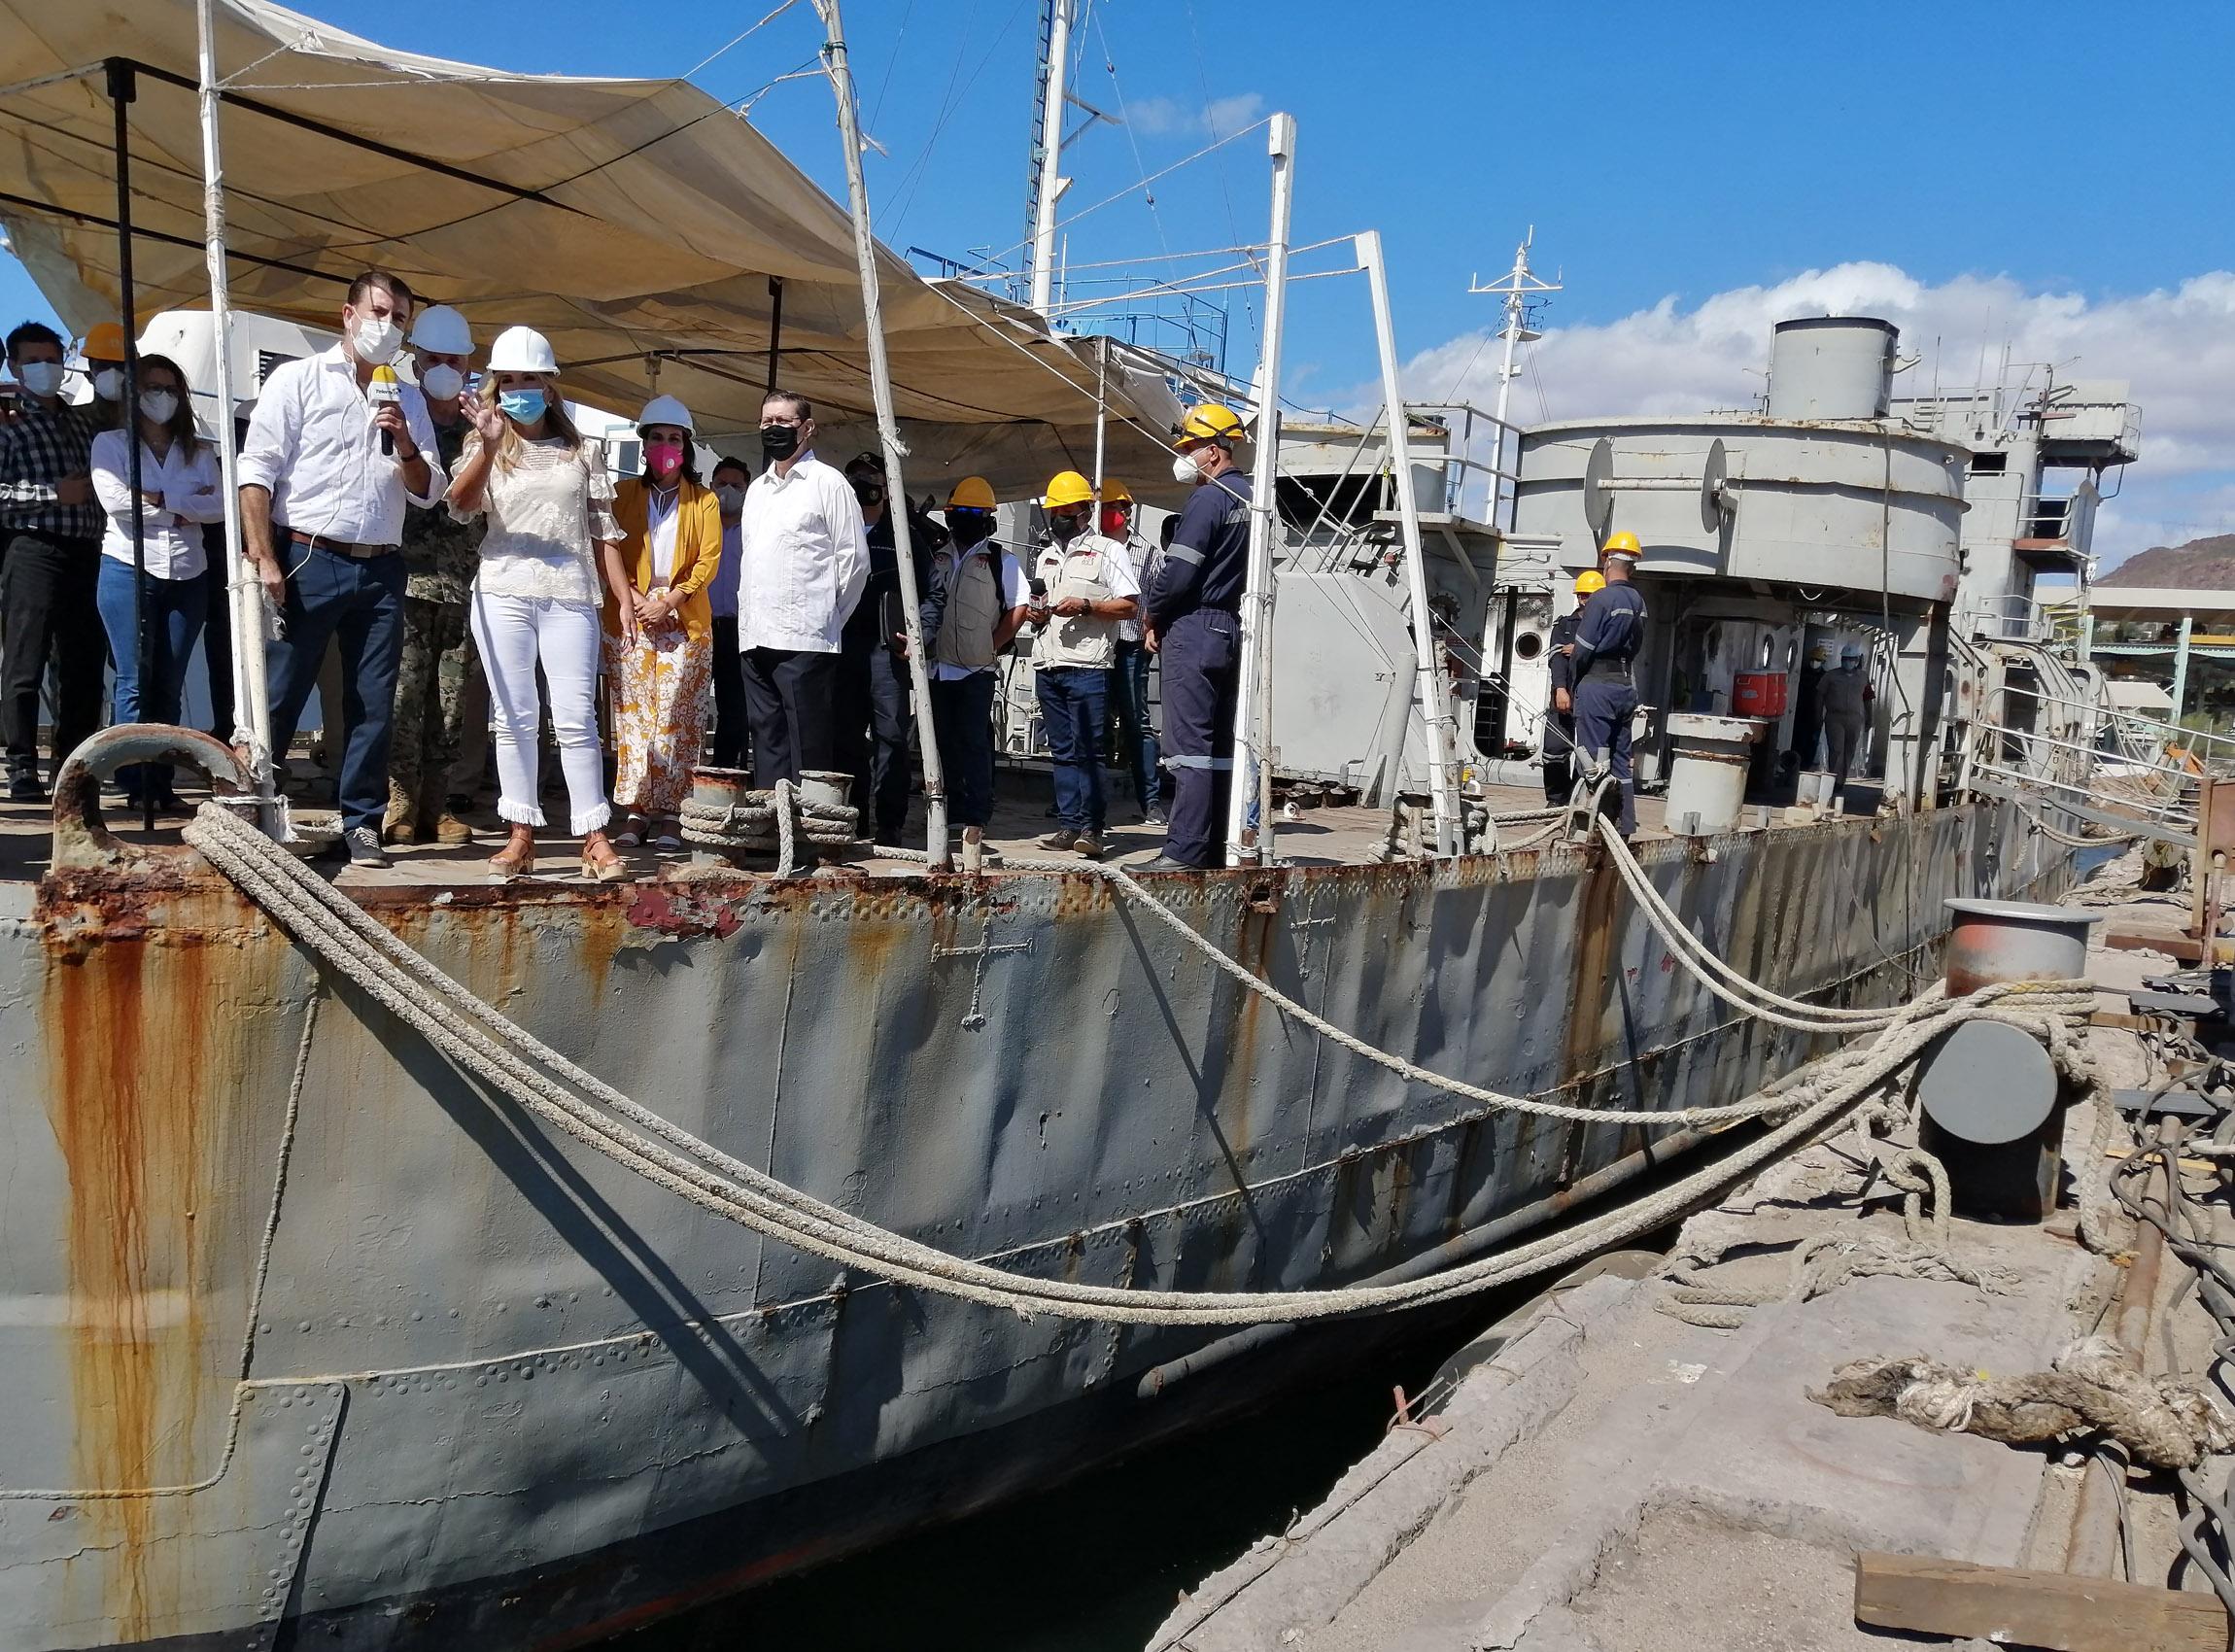 Guaymas barco